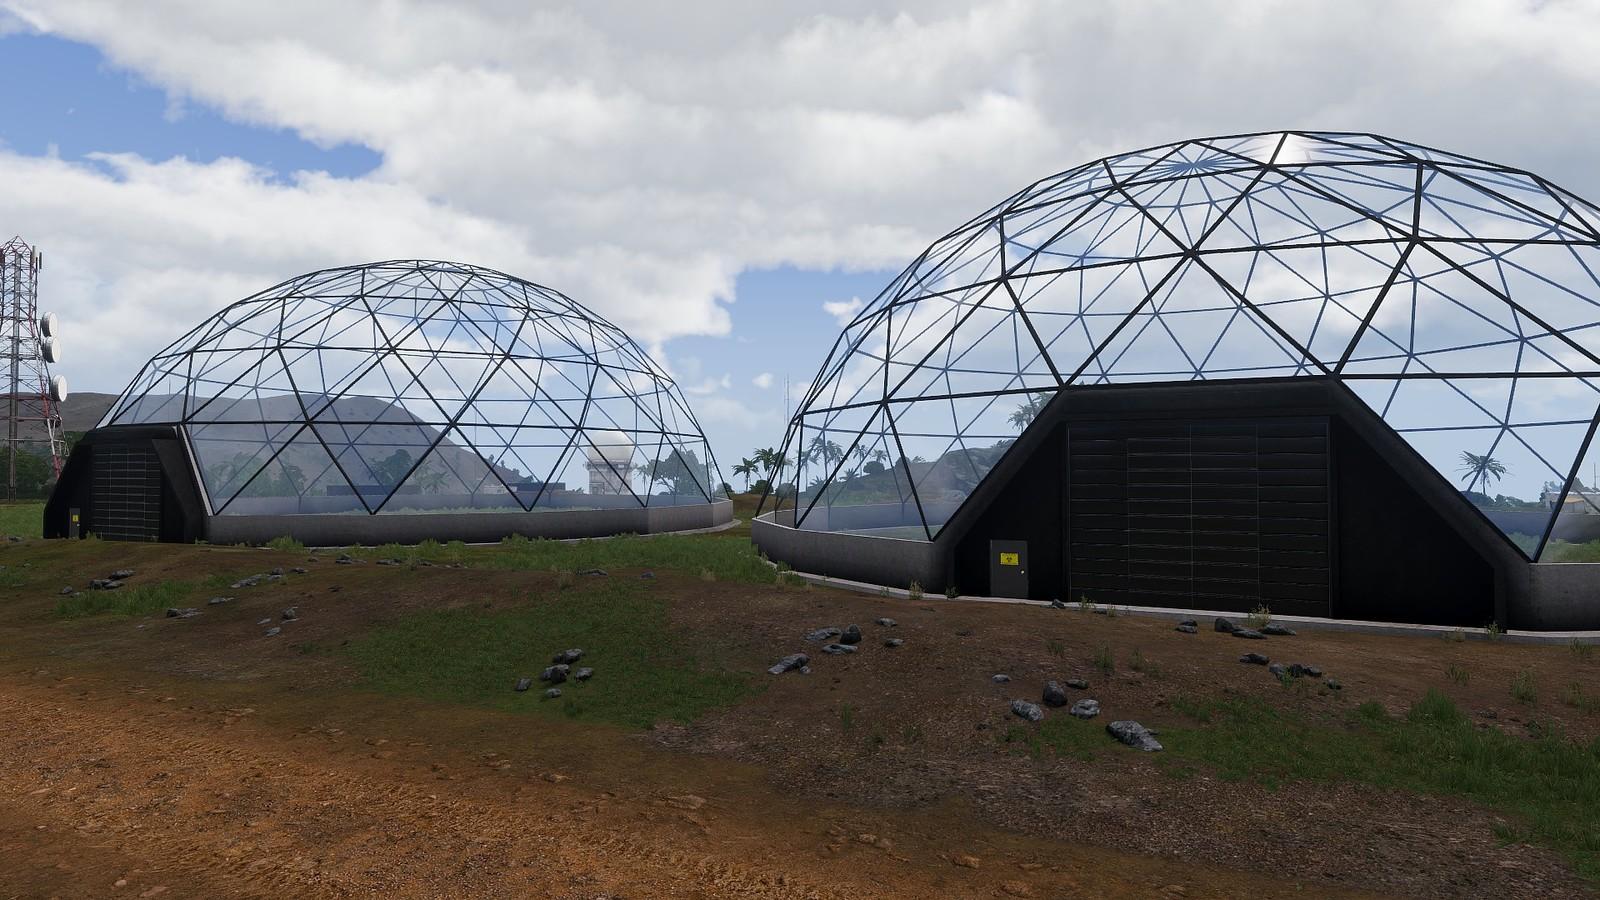 Glass Biohazard Research Domes